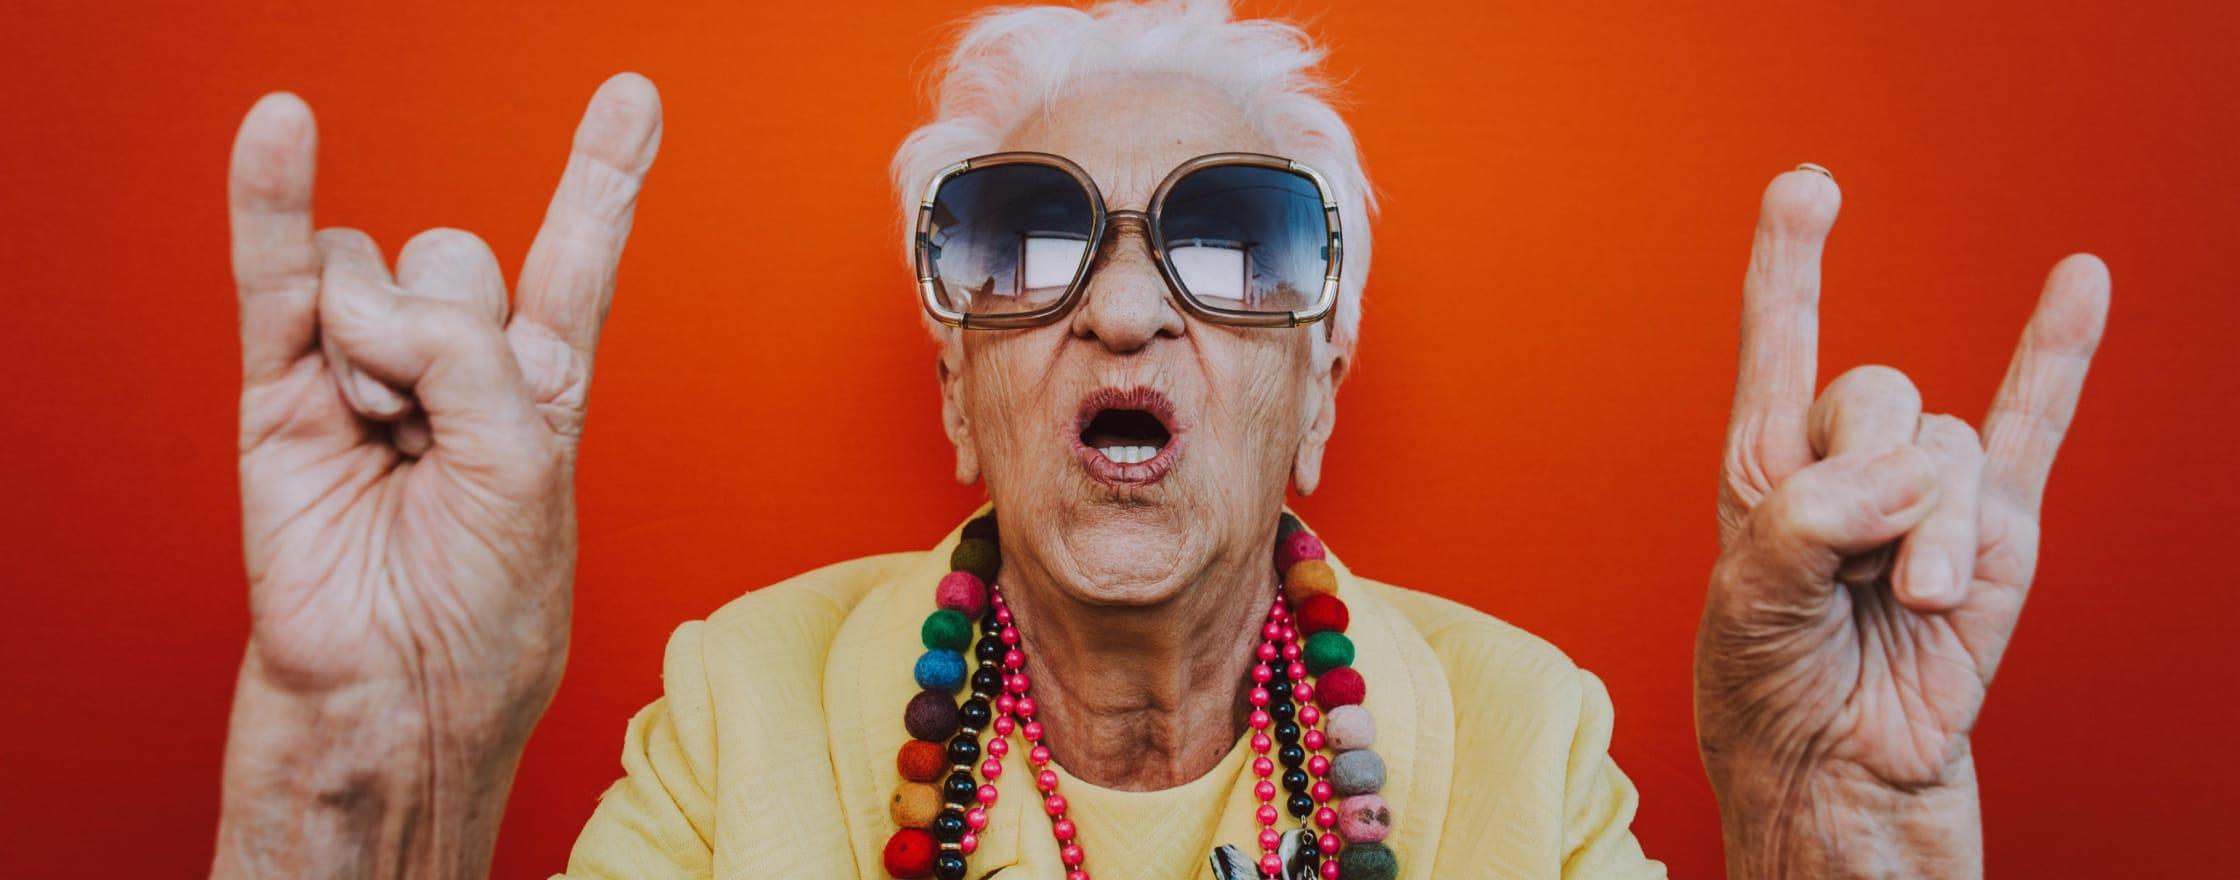 Rockstar grandma throwing up horns